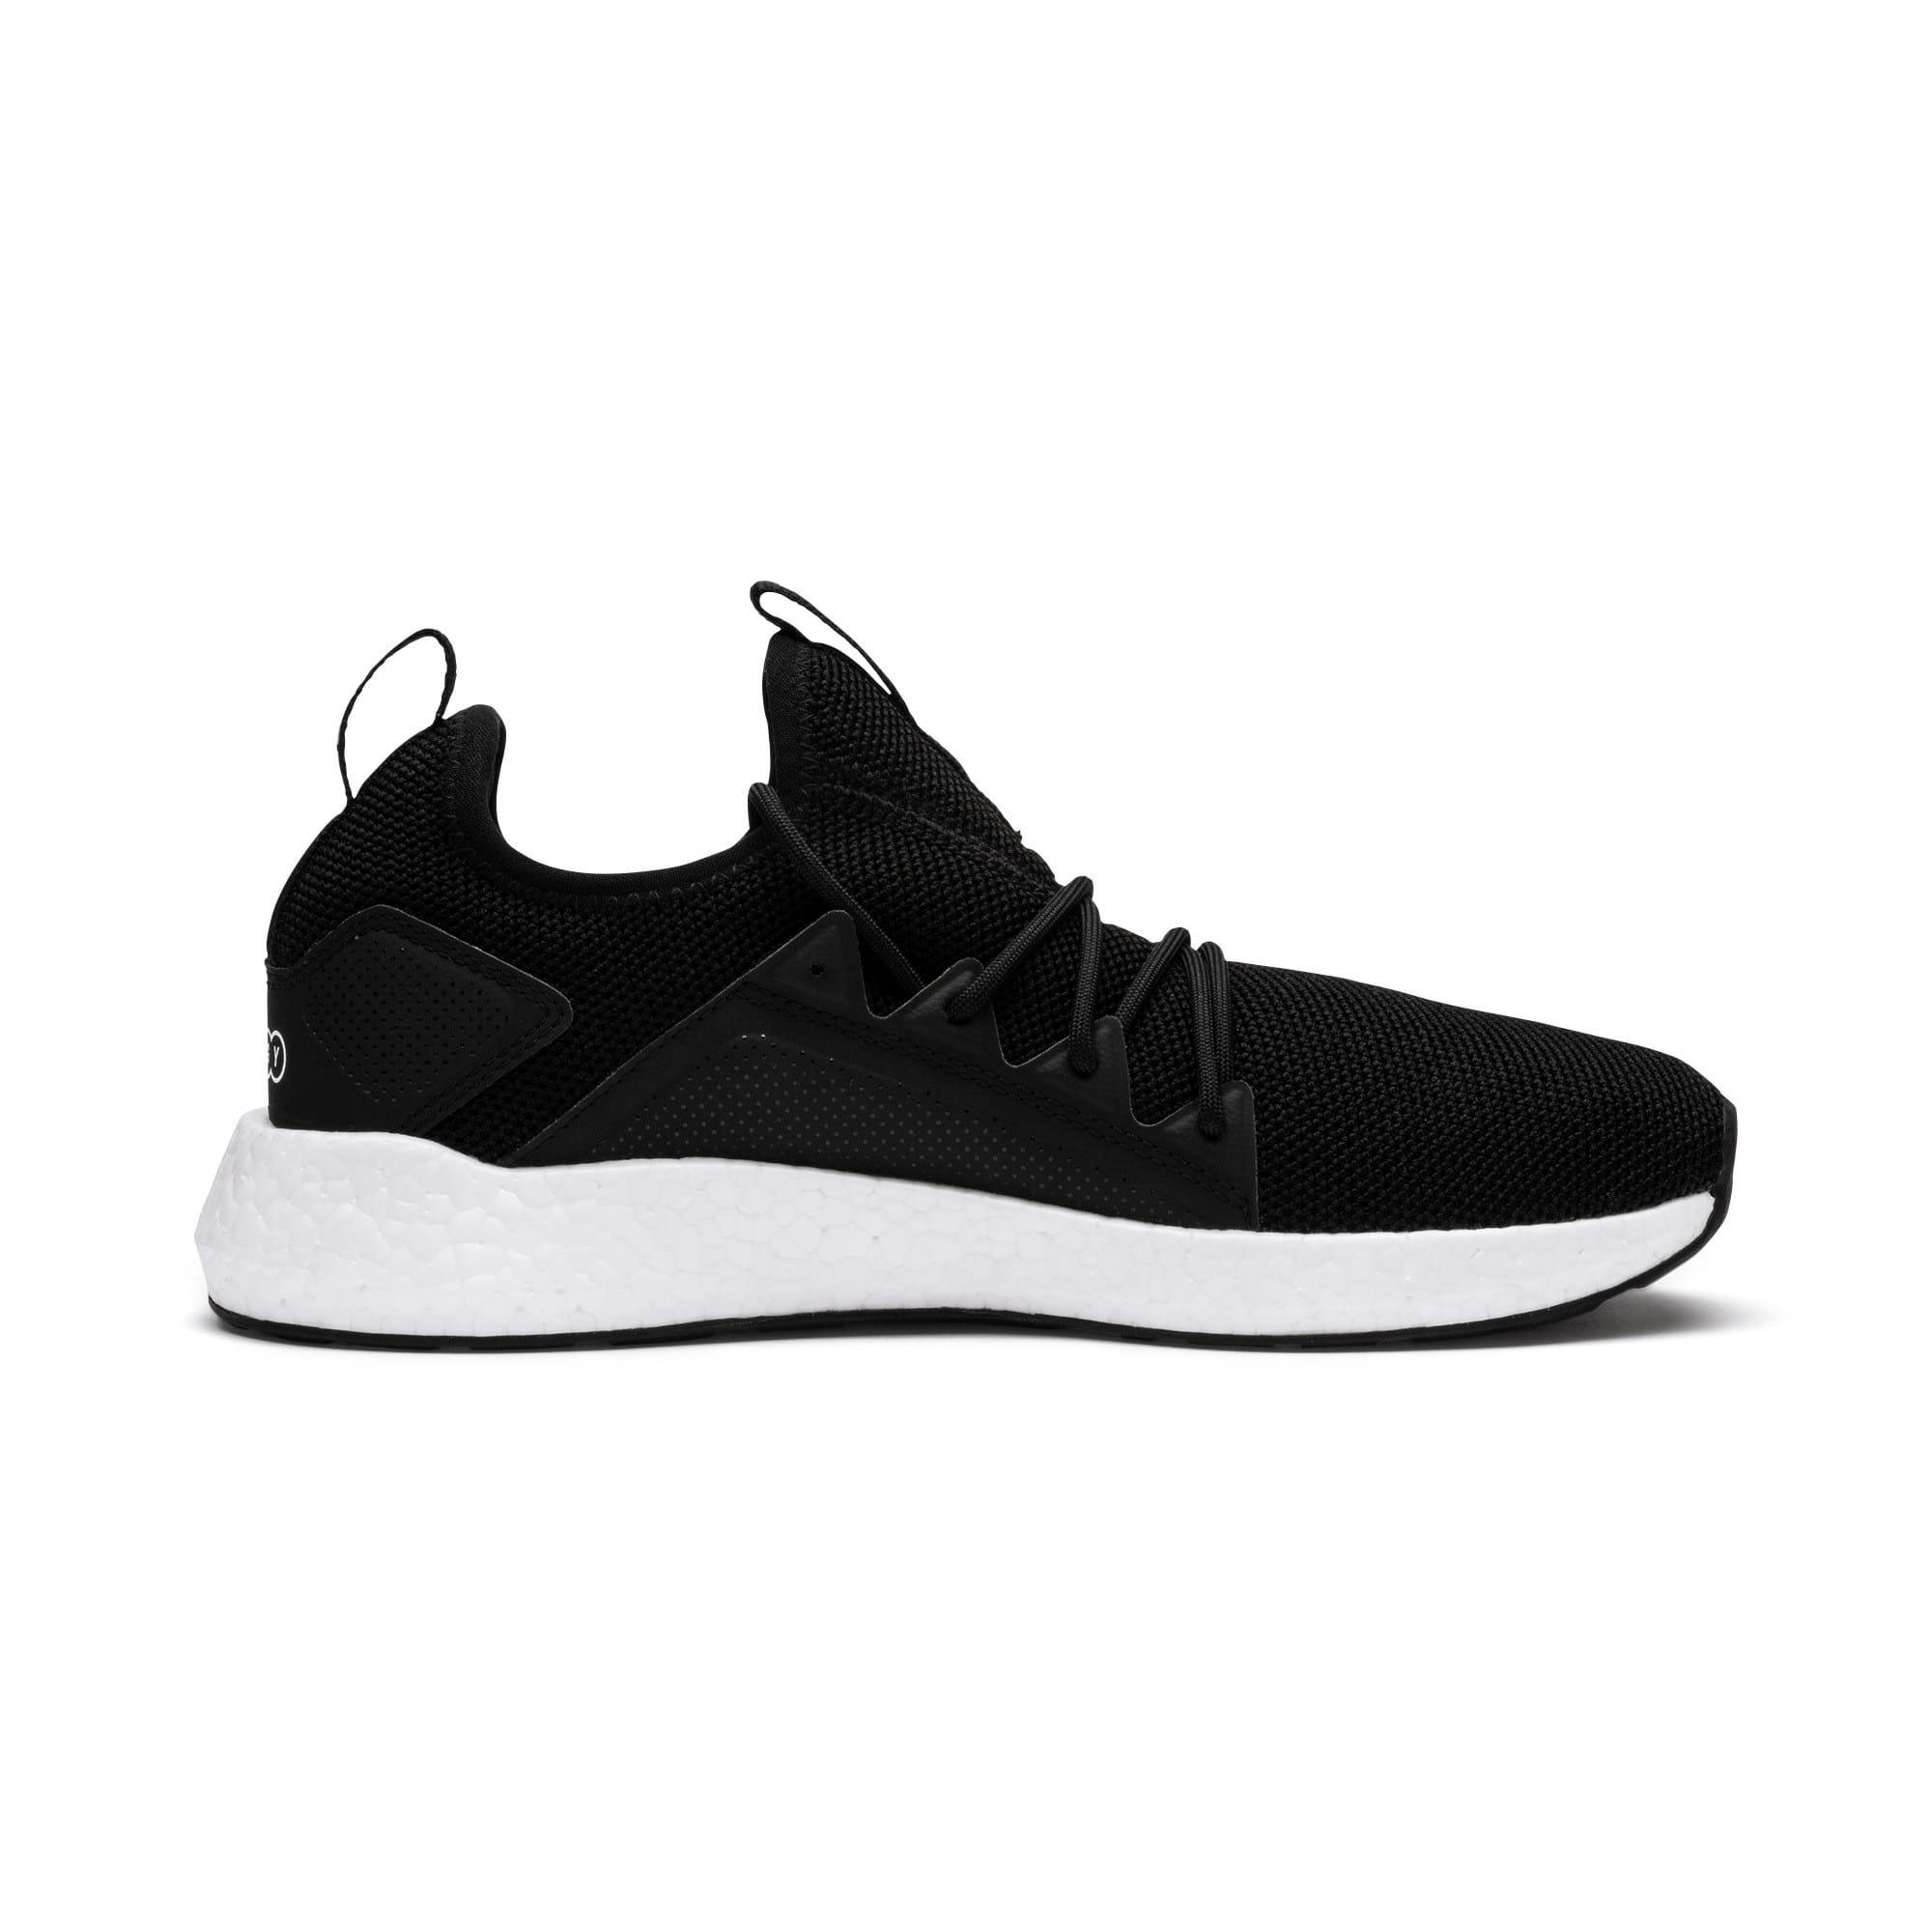 Thumbnail 5 of NRGY Neko Women's Running Shoes, Puma Black-Puma White, medium